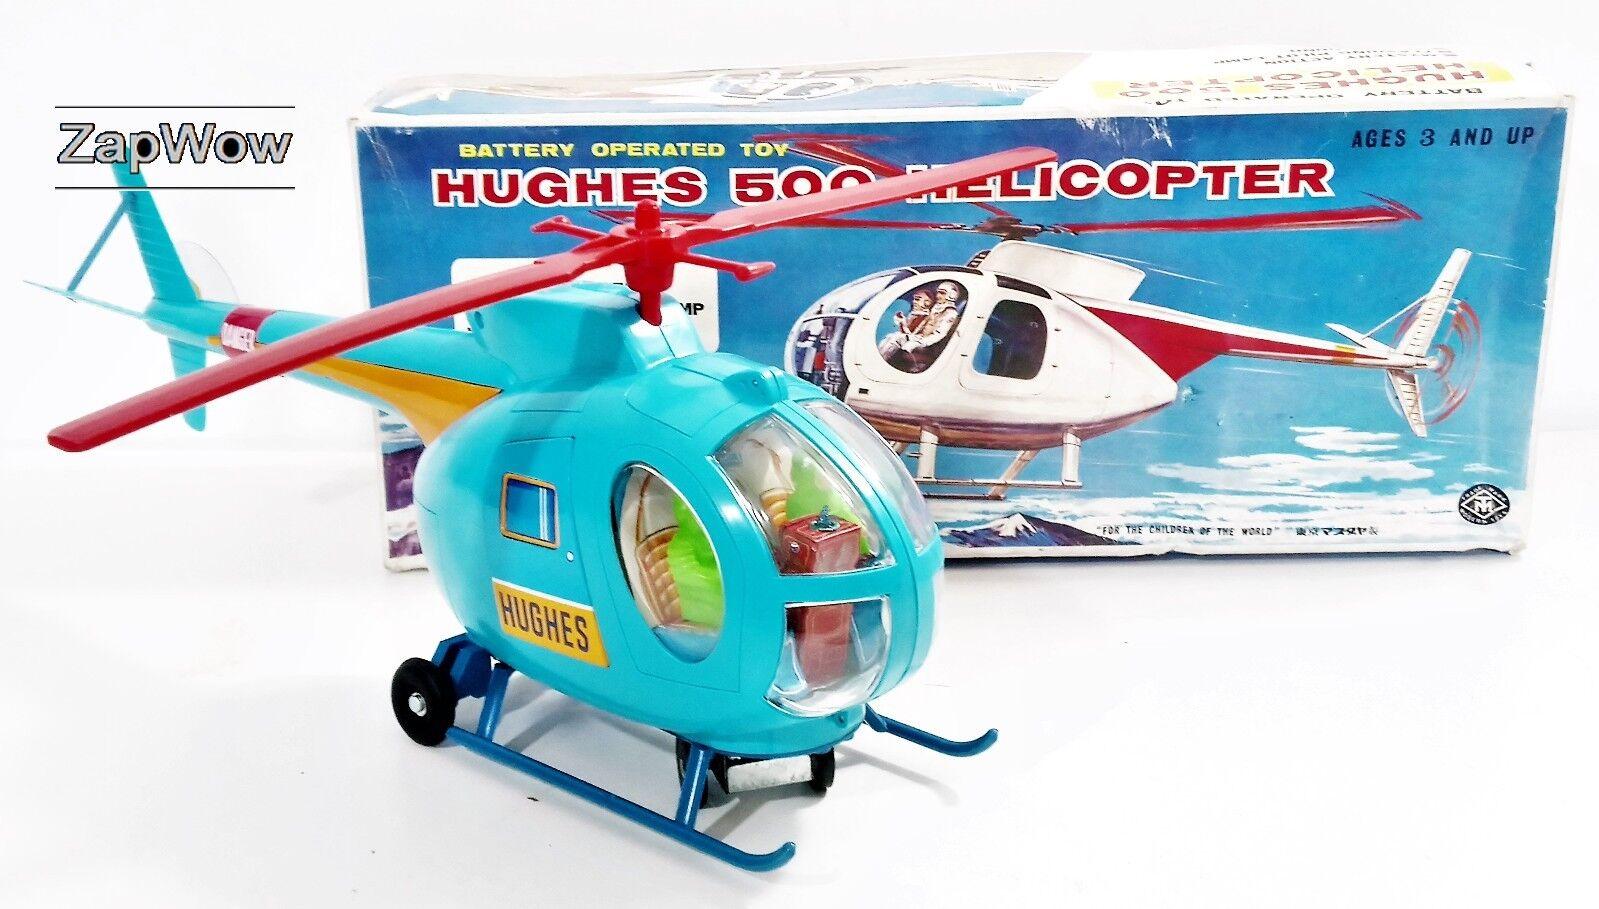 HUGHES 500 HELICOPTER 1970s Masudaya Magnum PI Detective Modern Toys Electronic